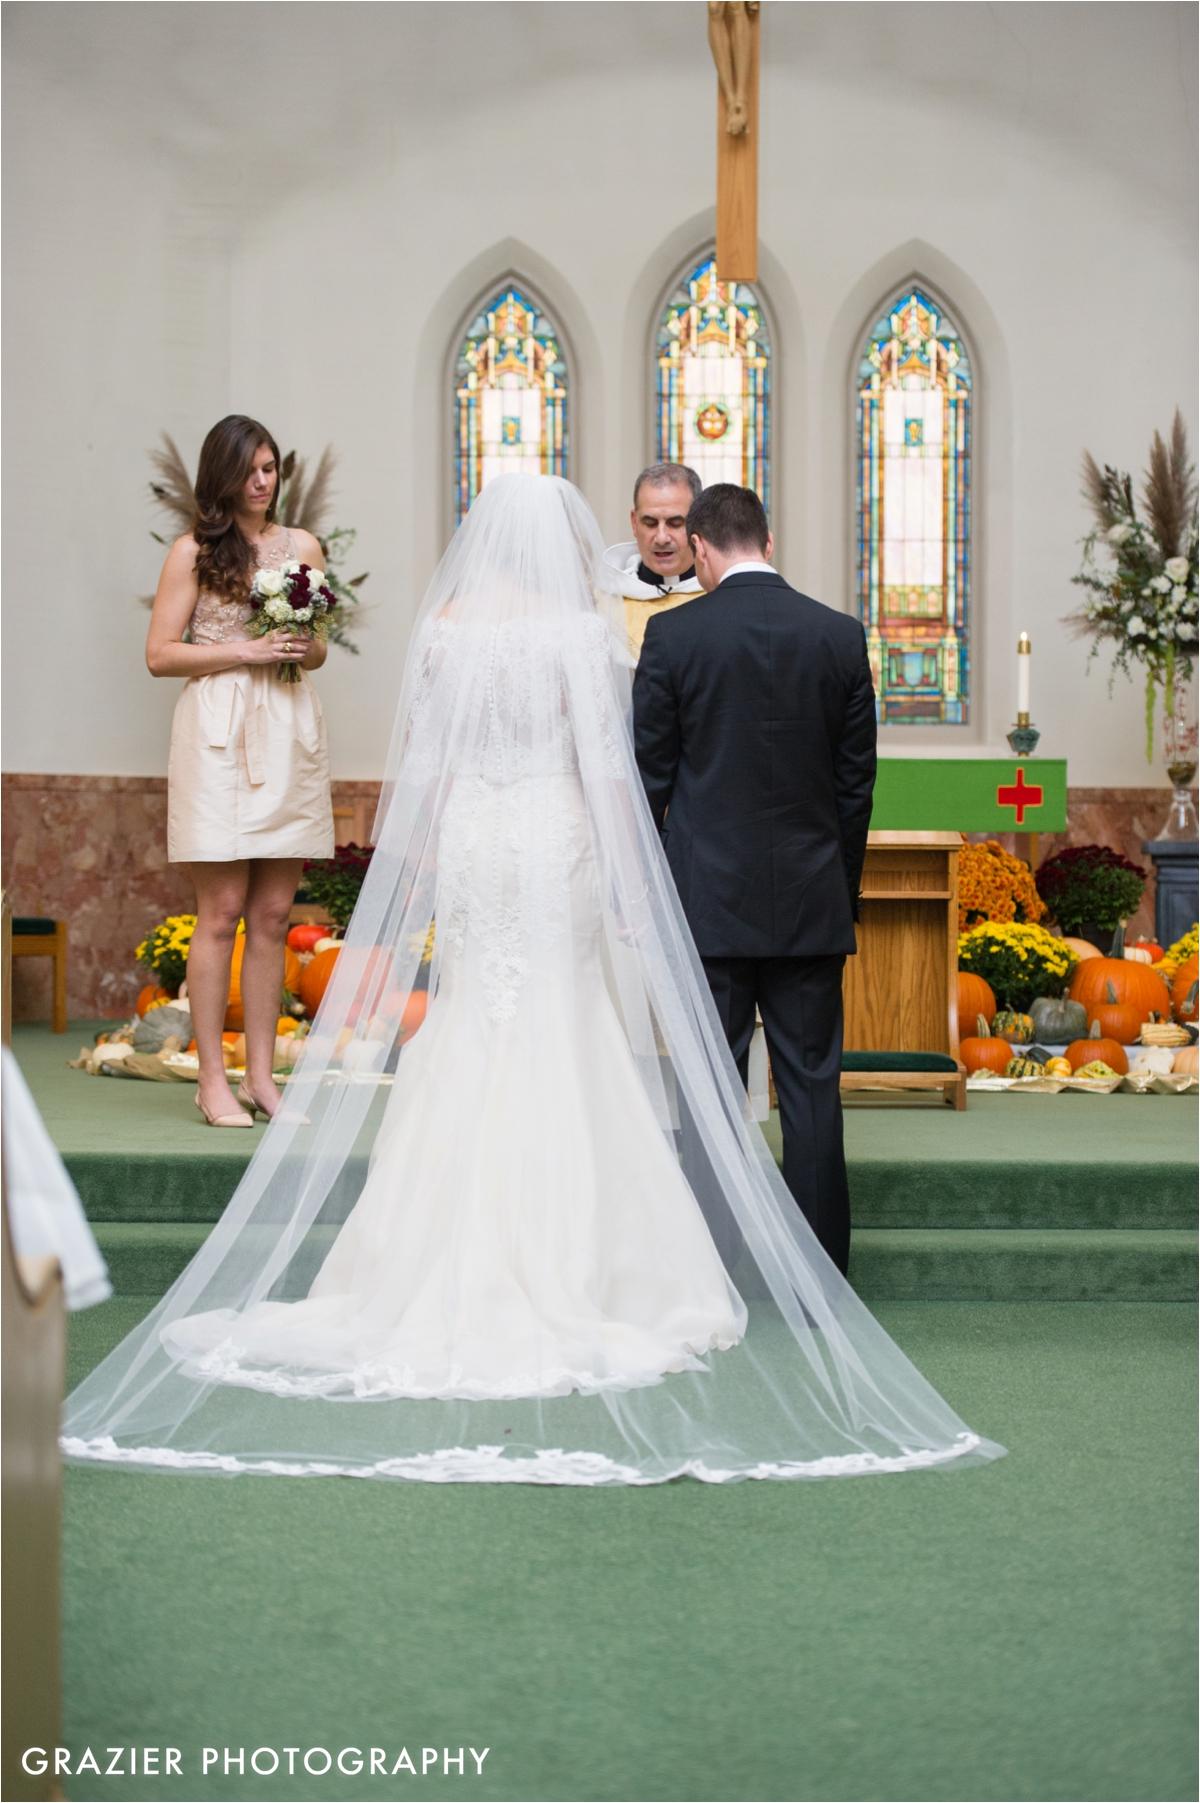 Mount-Washington-Hotel-Wedding-Grazier-Photography_0017.jpg